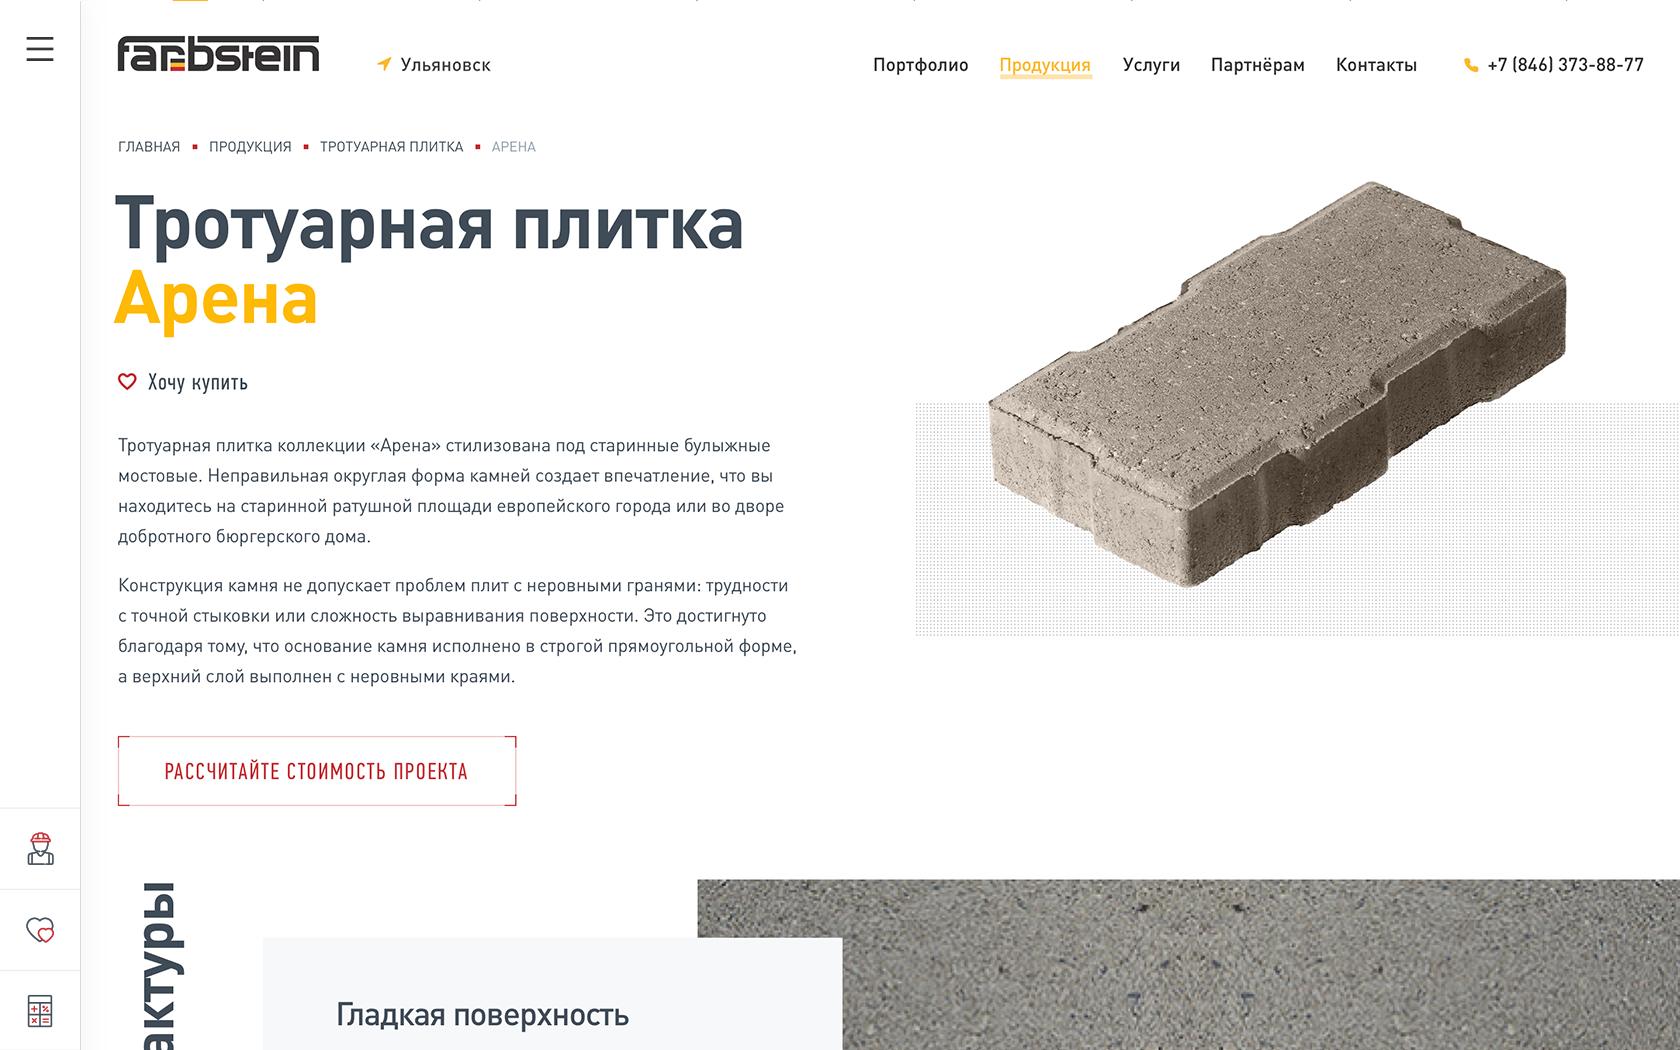 Сайт для компании Farbstein